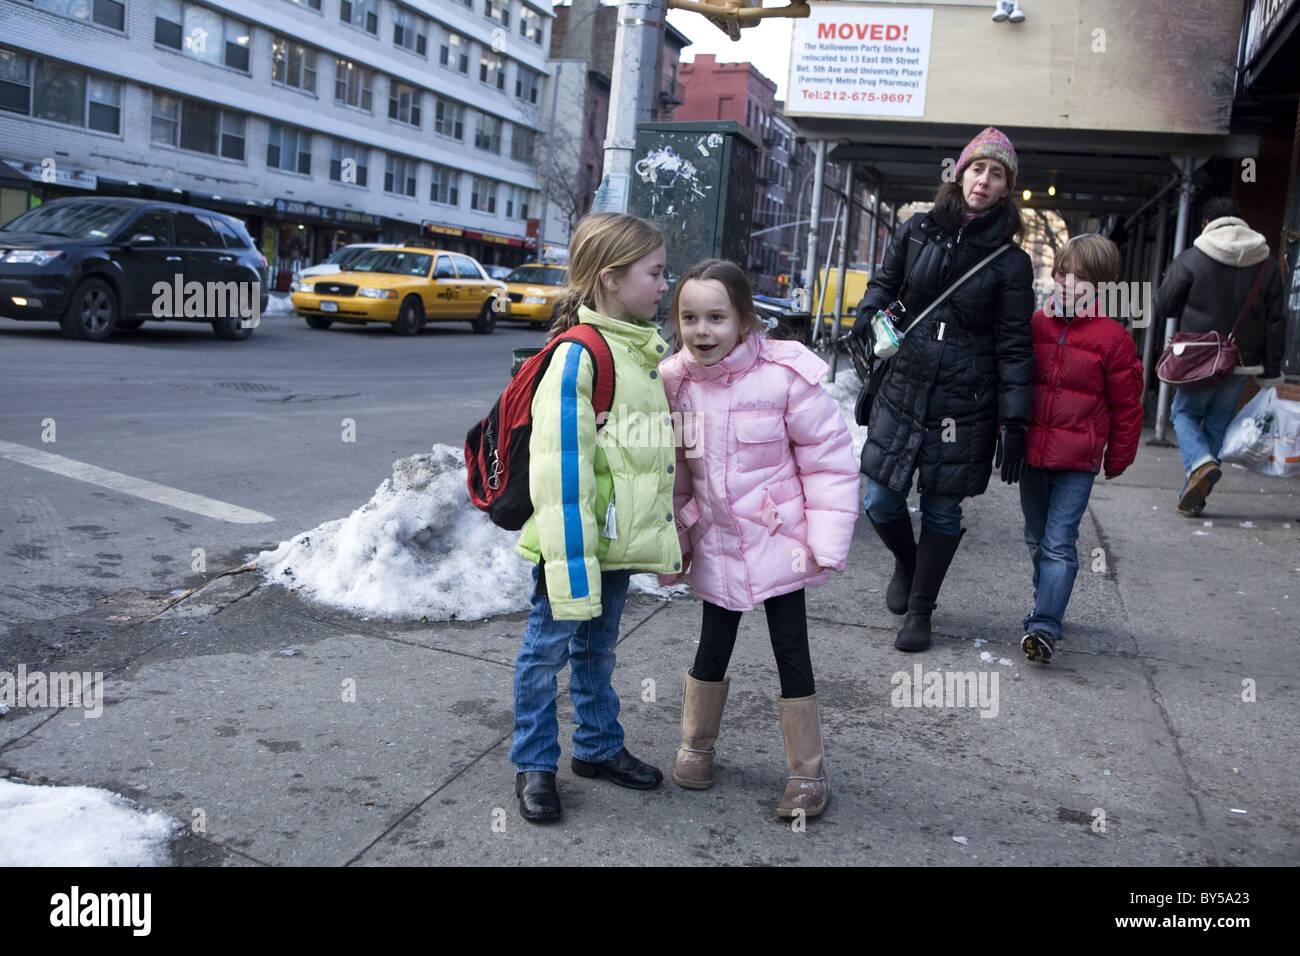 Children going home after school, Manhattan, New York City. - Stock Image